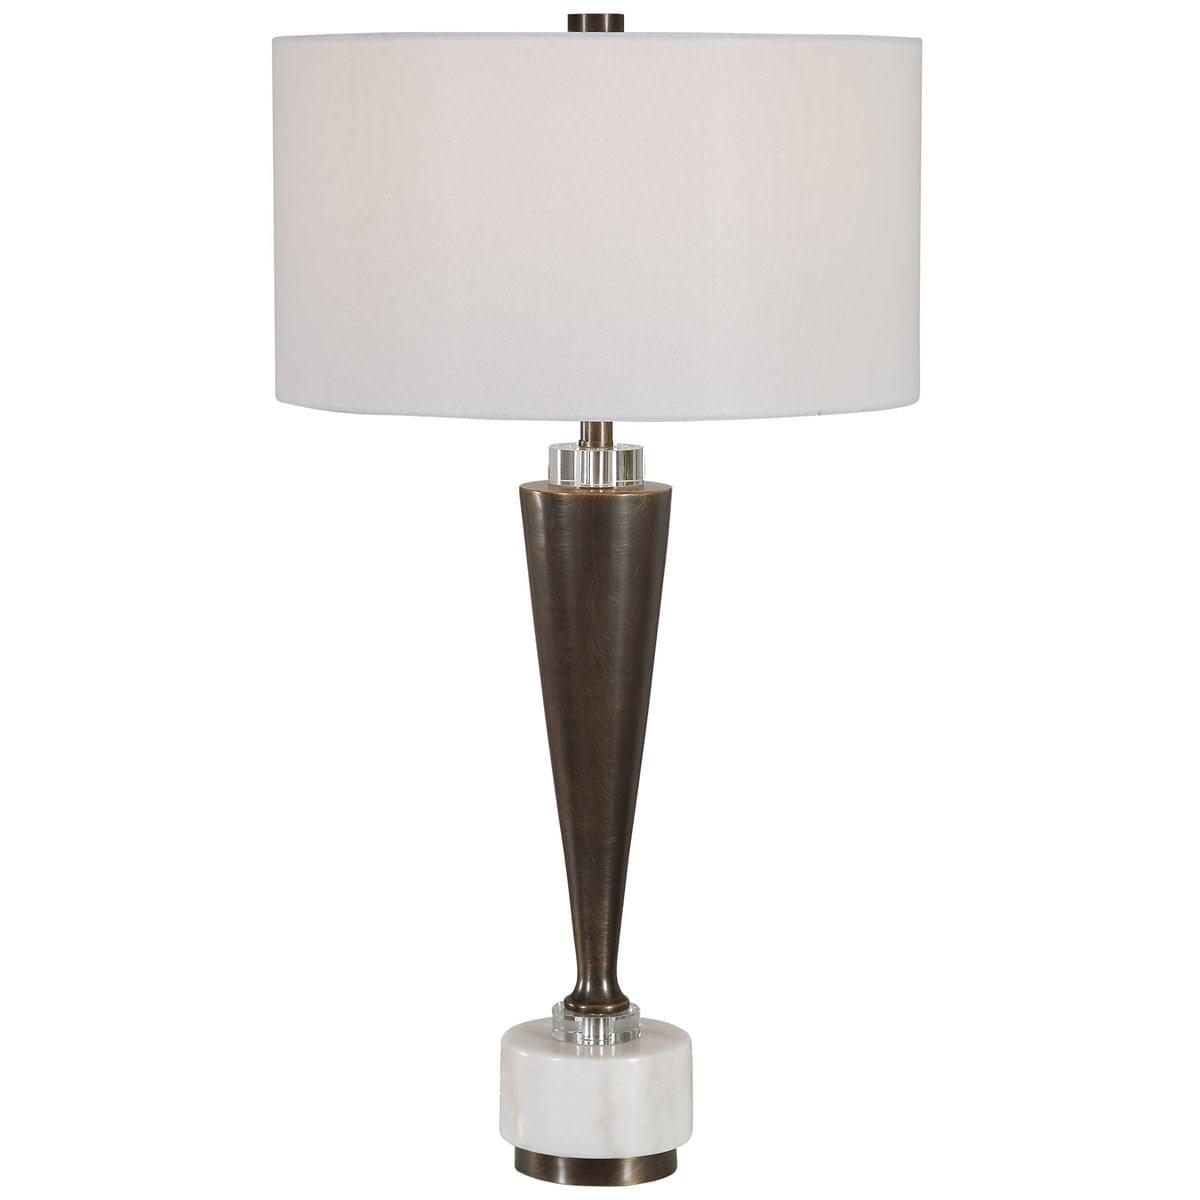 Uttermost Merrigan Table Lamp at Mums Place Furniture Carmel CA